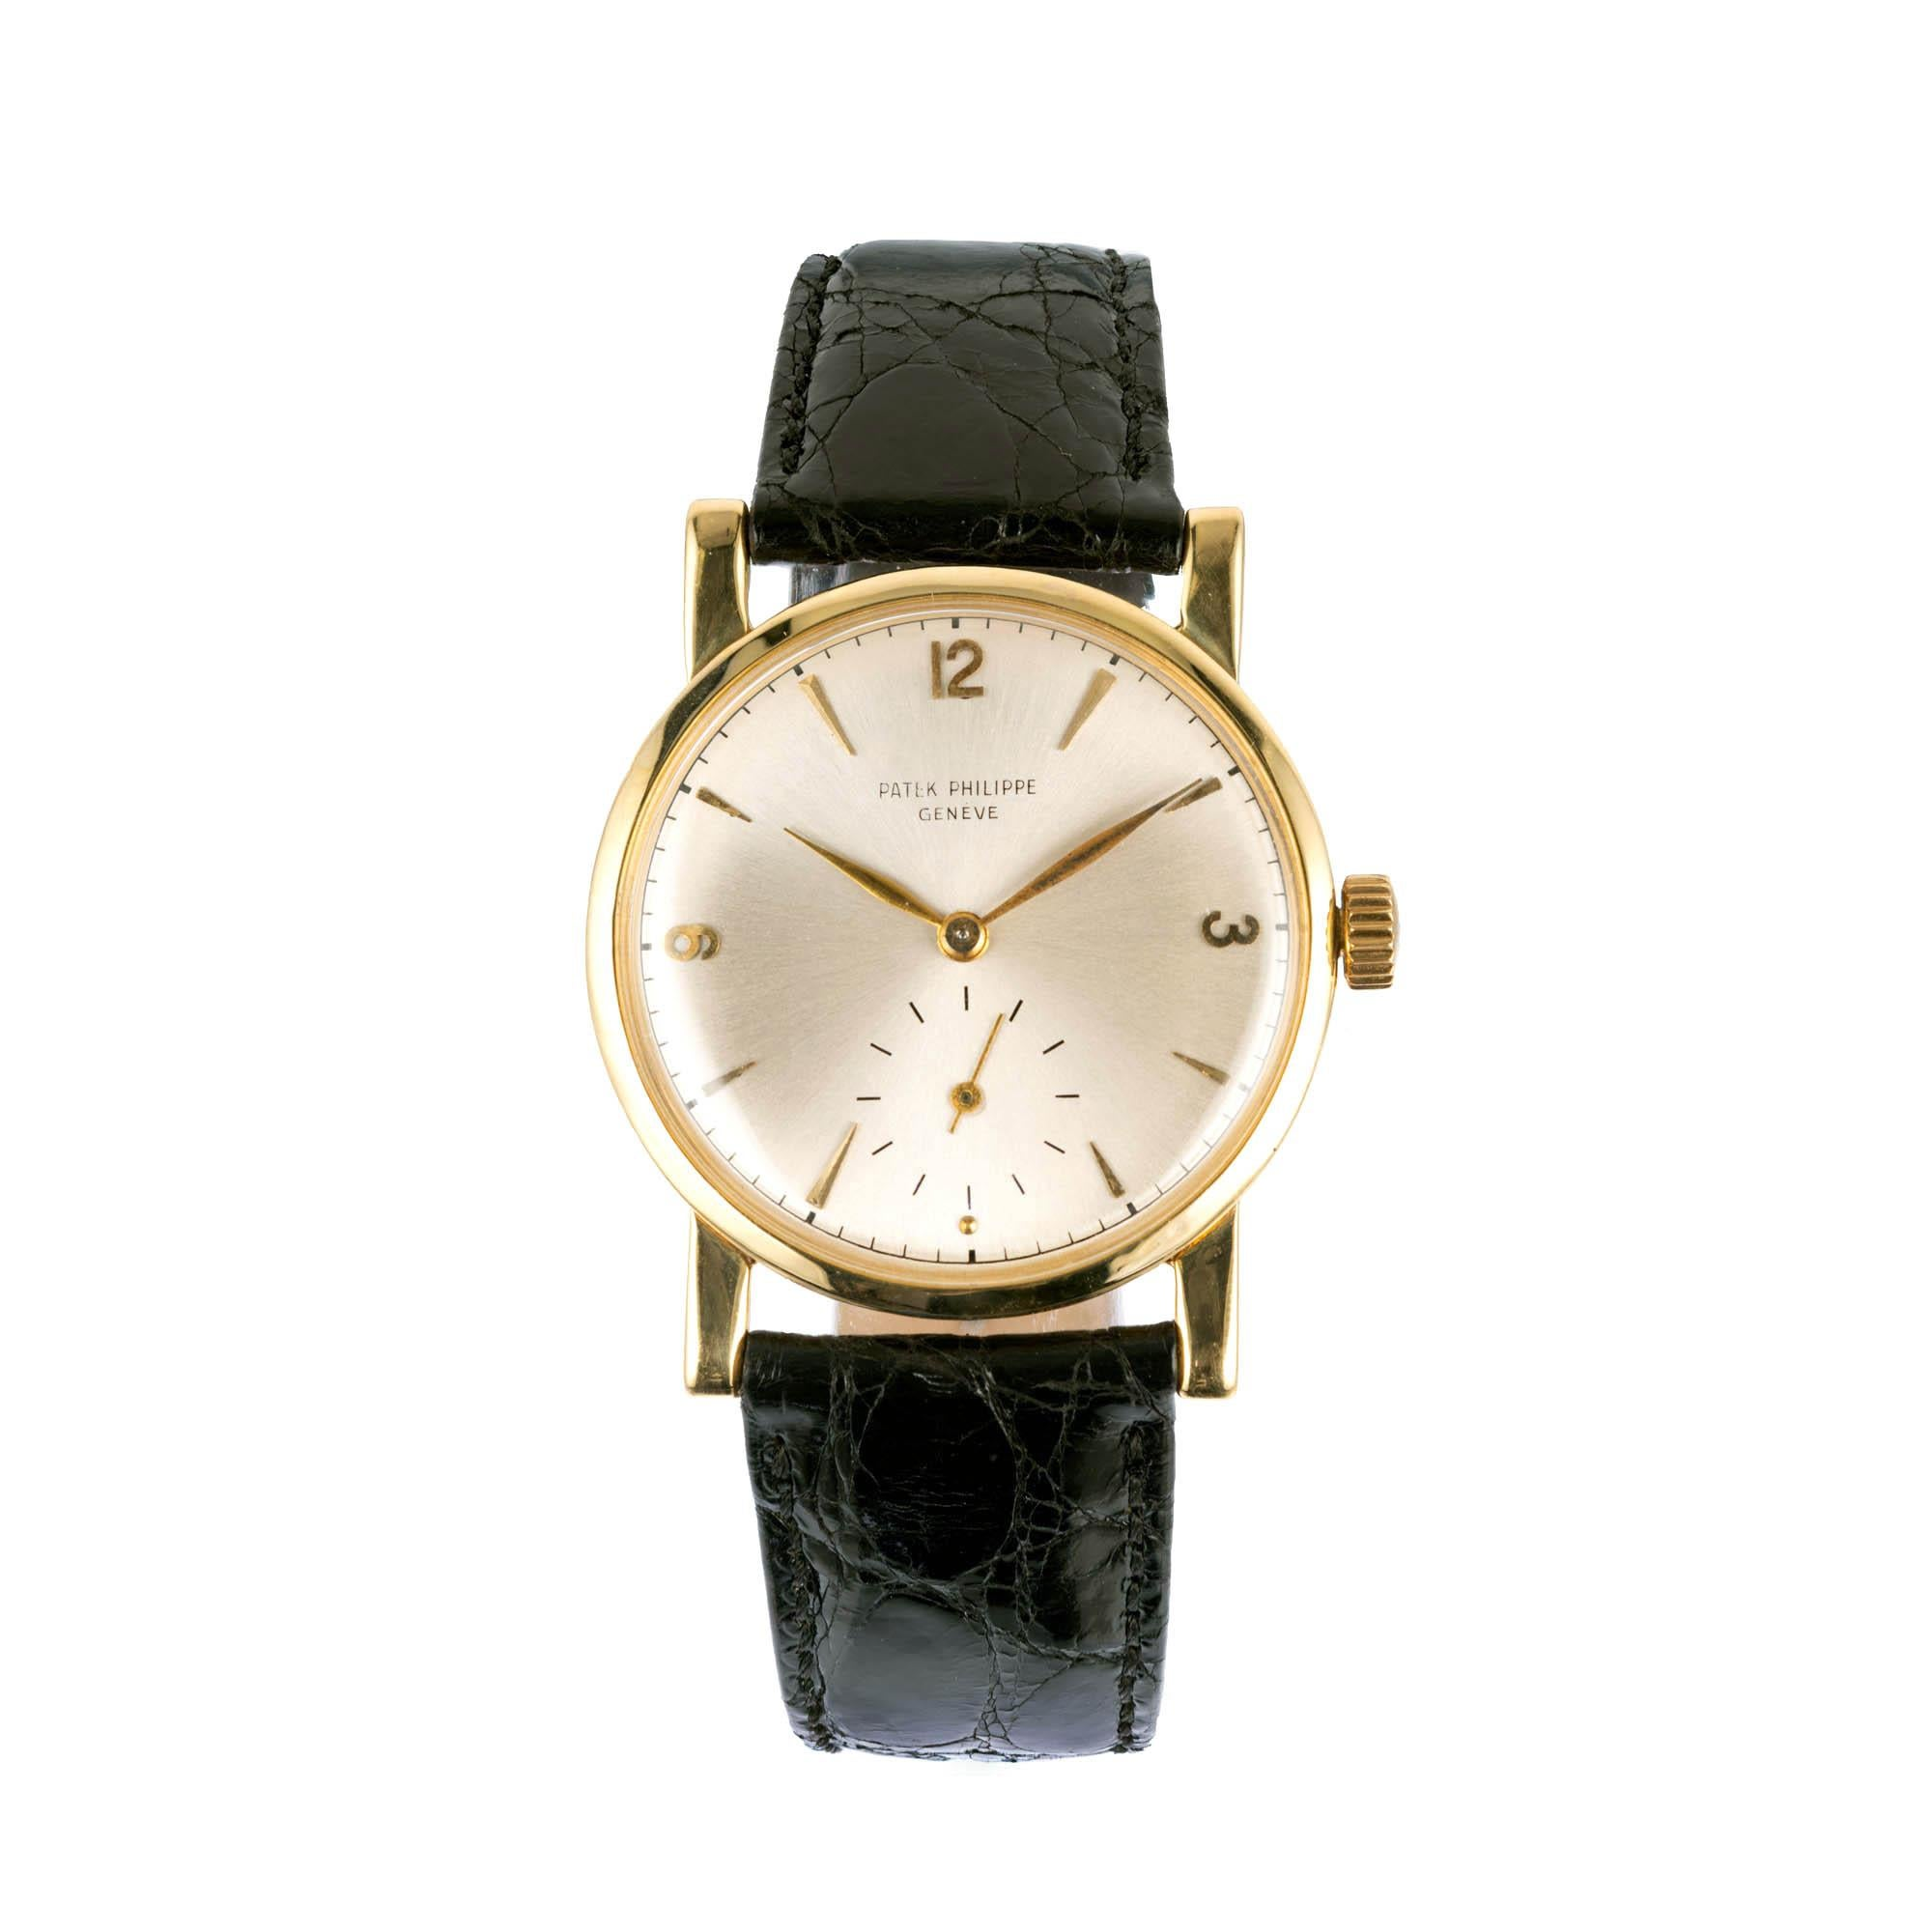 Patek Philippe Yellow Gold Wristwatch Ref 1578, circa 1955